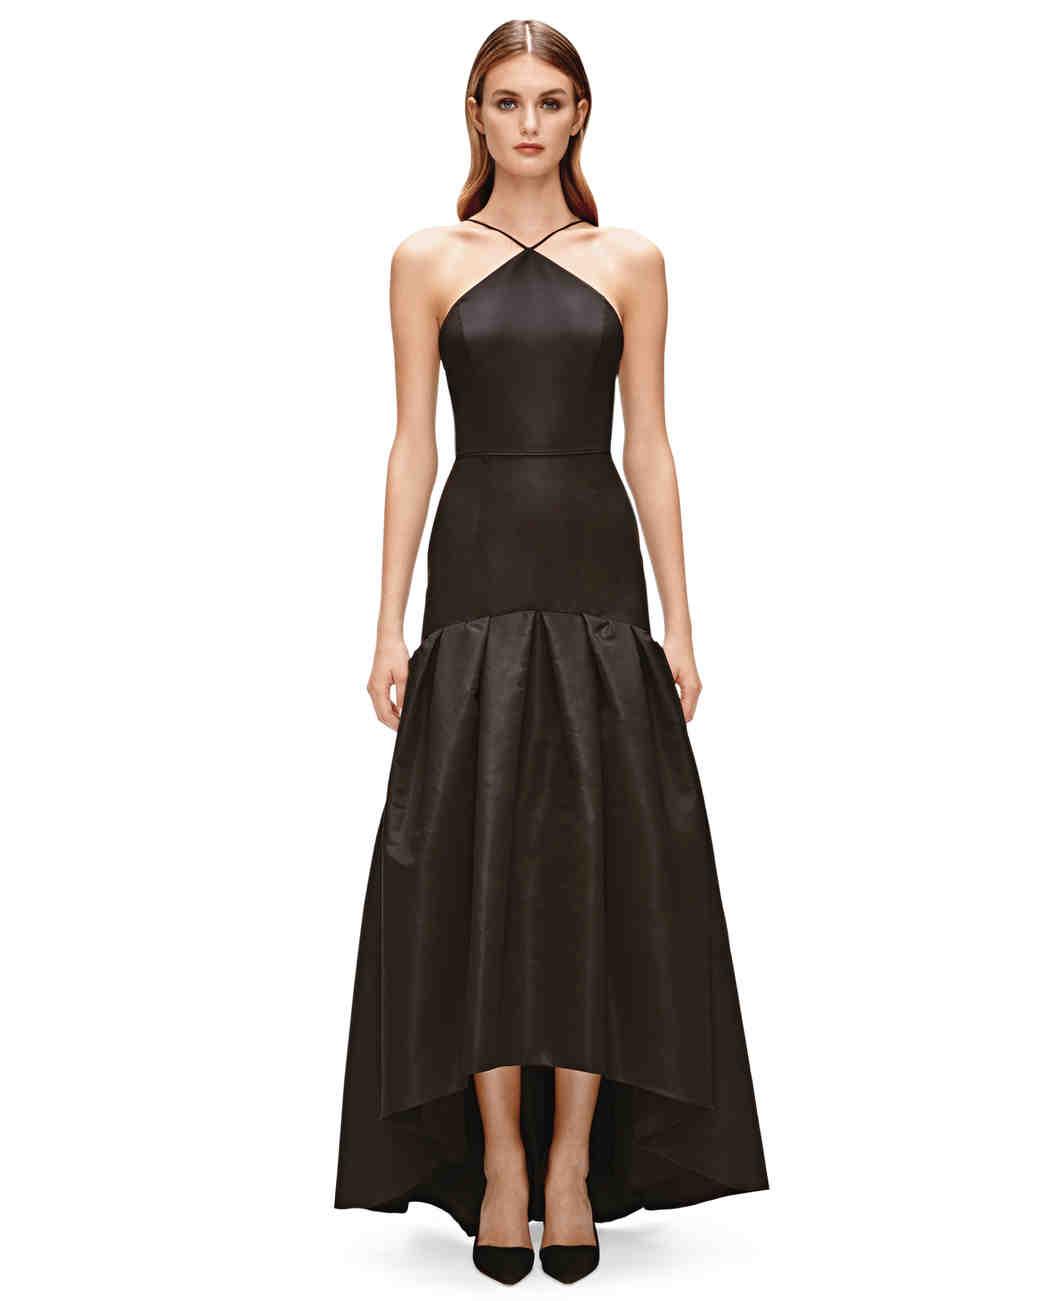 black-dress-front-461344-s111770.jpg